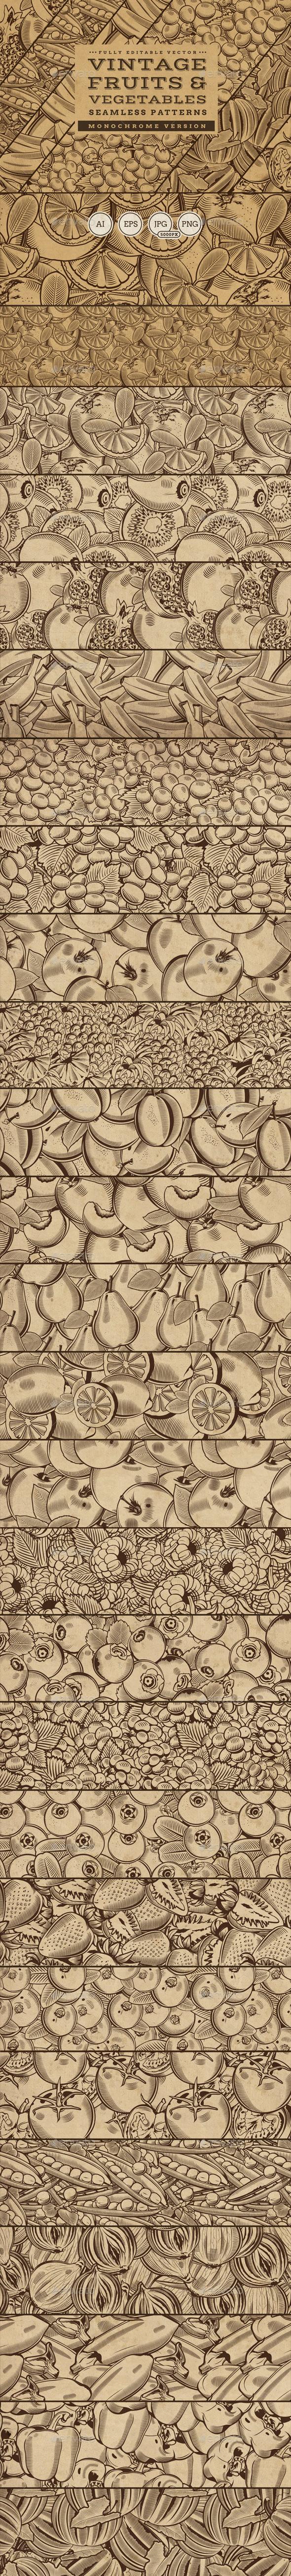 Fruits & Vegetables Vintage Seamless Patterns - Patterns Decorative